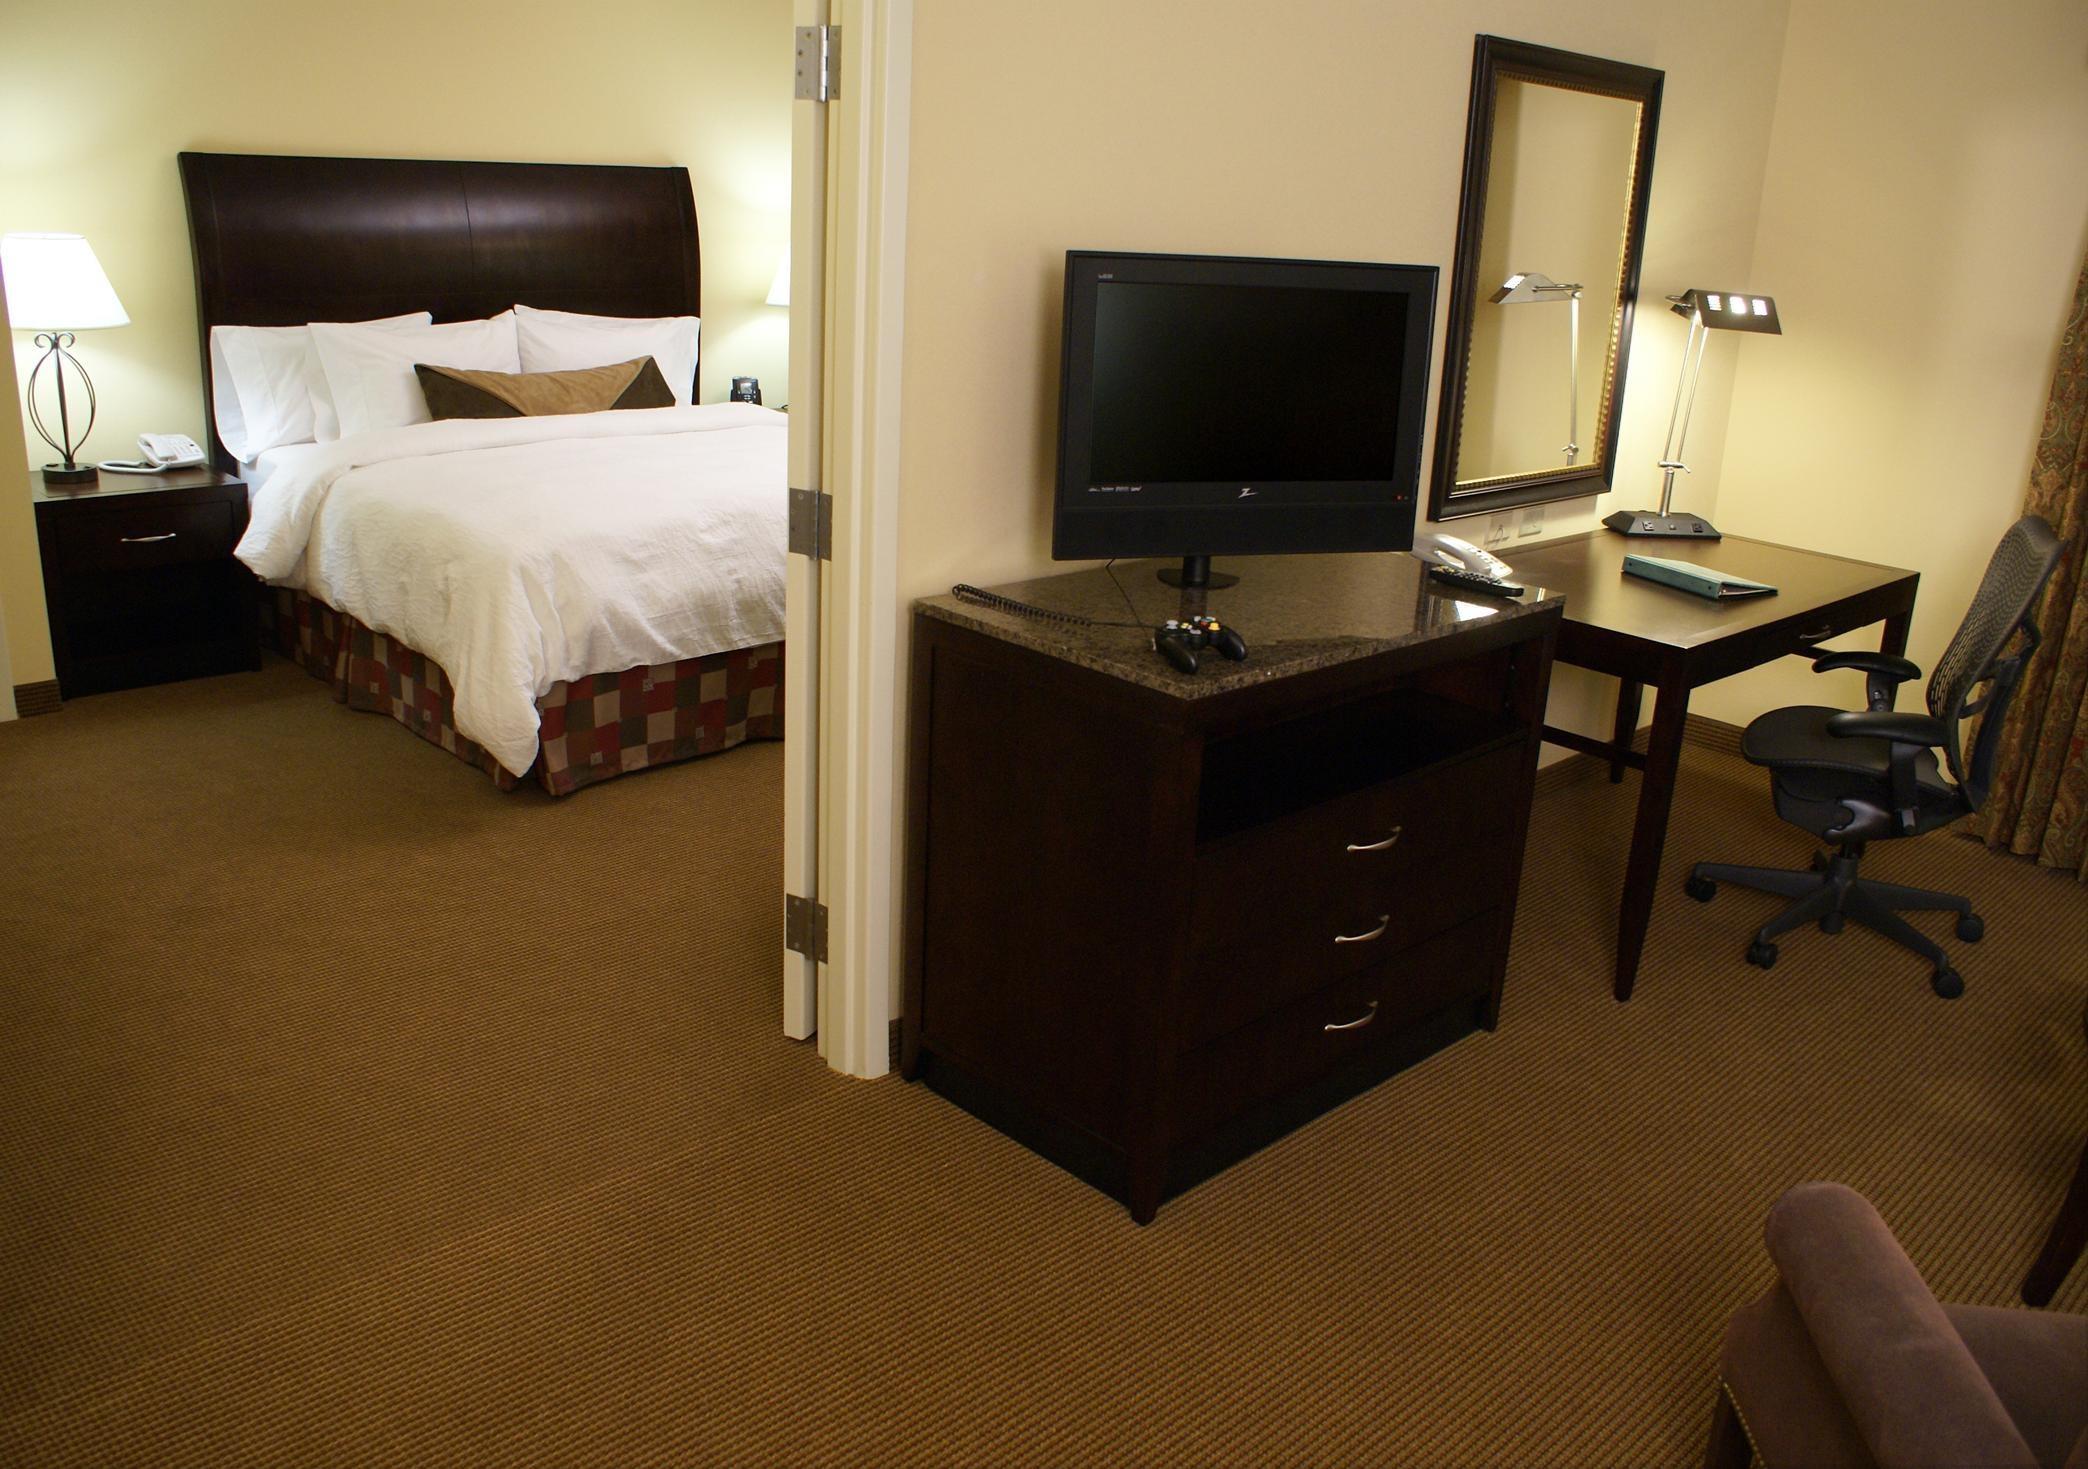 Hilton Garden Inn Denver/Highlands Ranch image 8